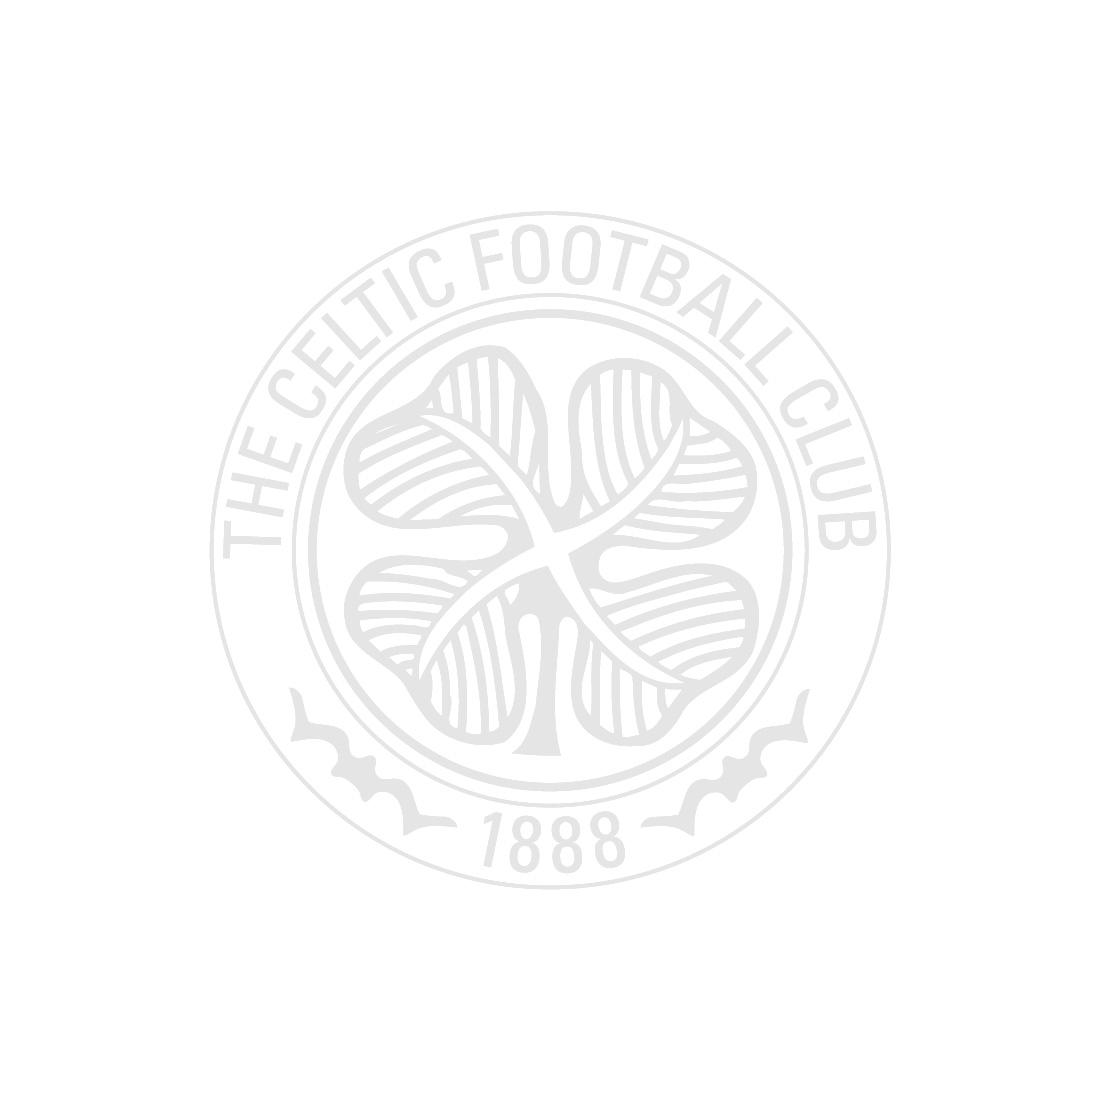 Celtic Pocket Polo Shirt - Online Exclusive